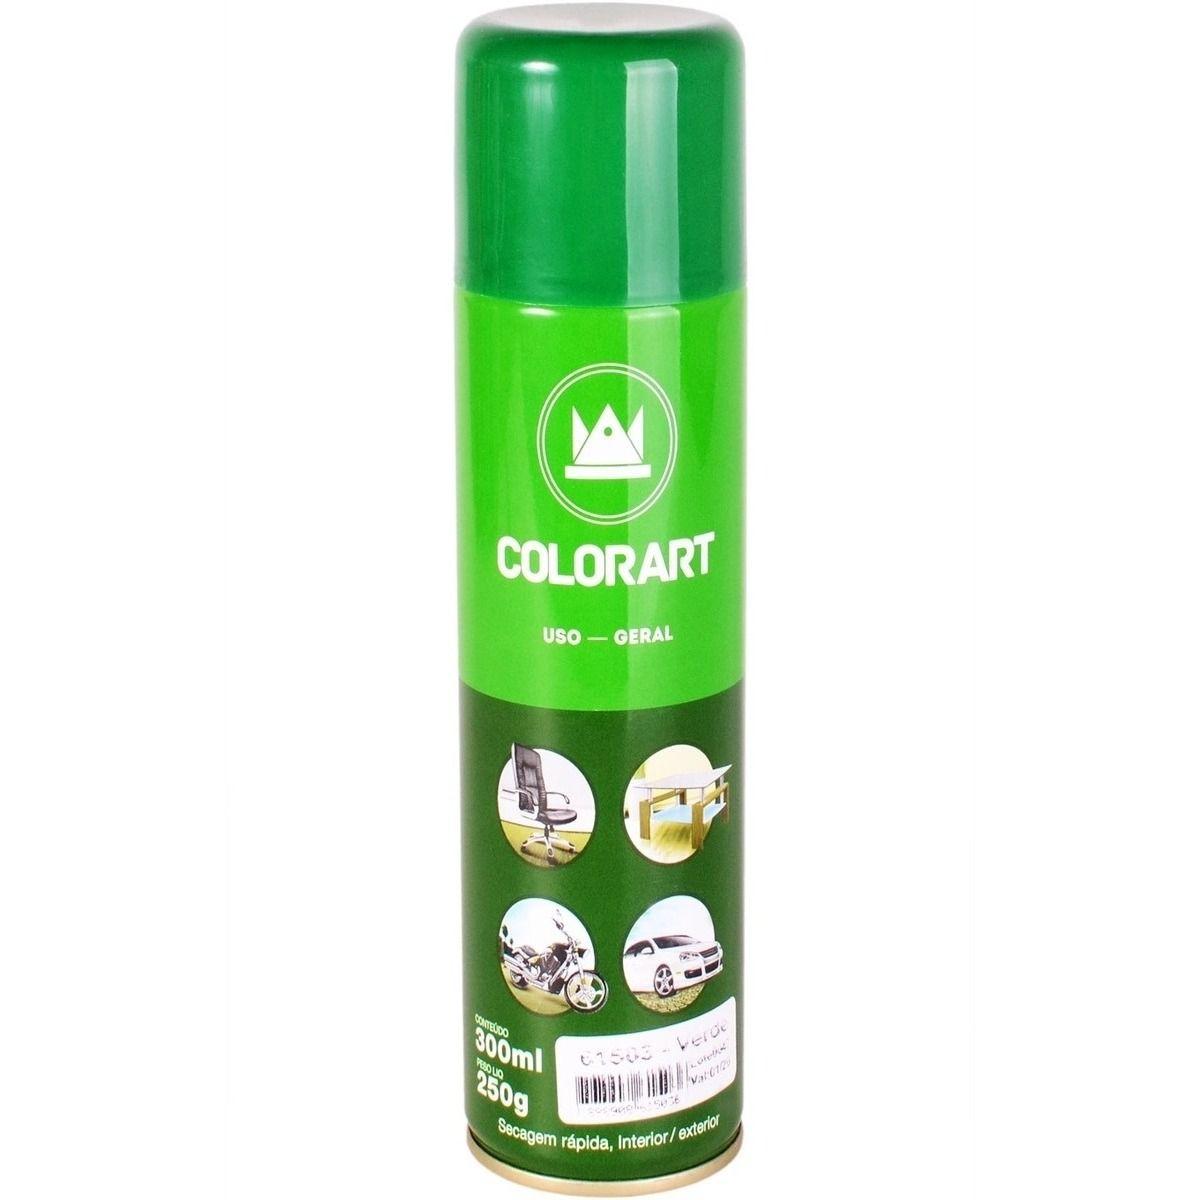 Tinta Spray Colorart Uso Geral Verde  - Rea Comércio - Sua Loja Completa!